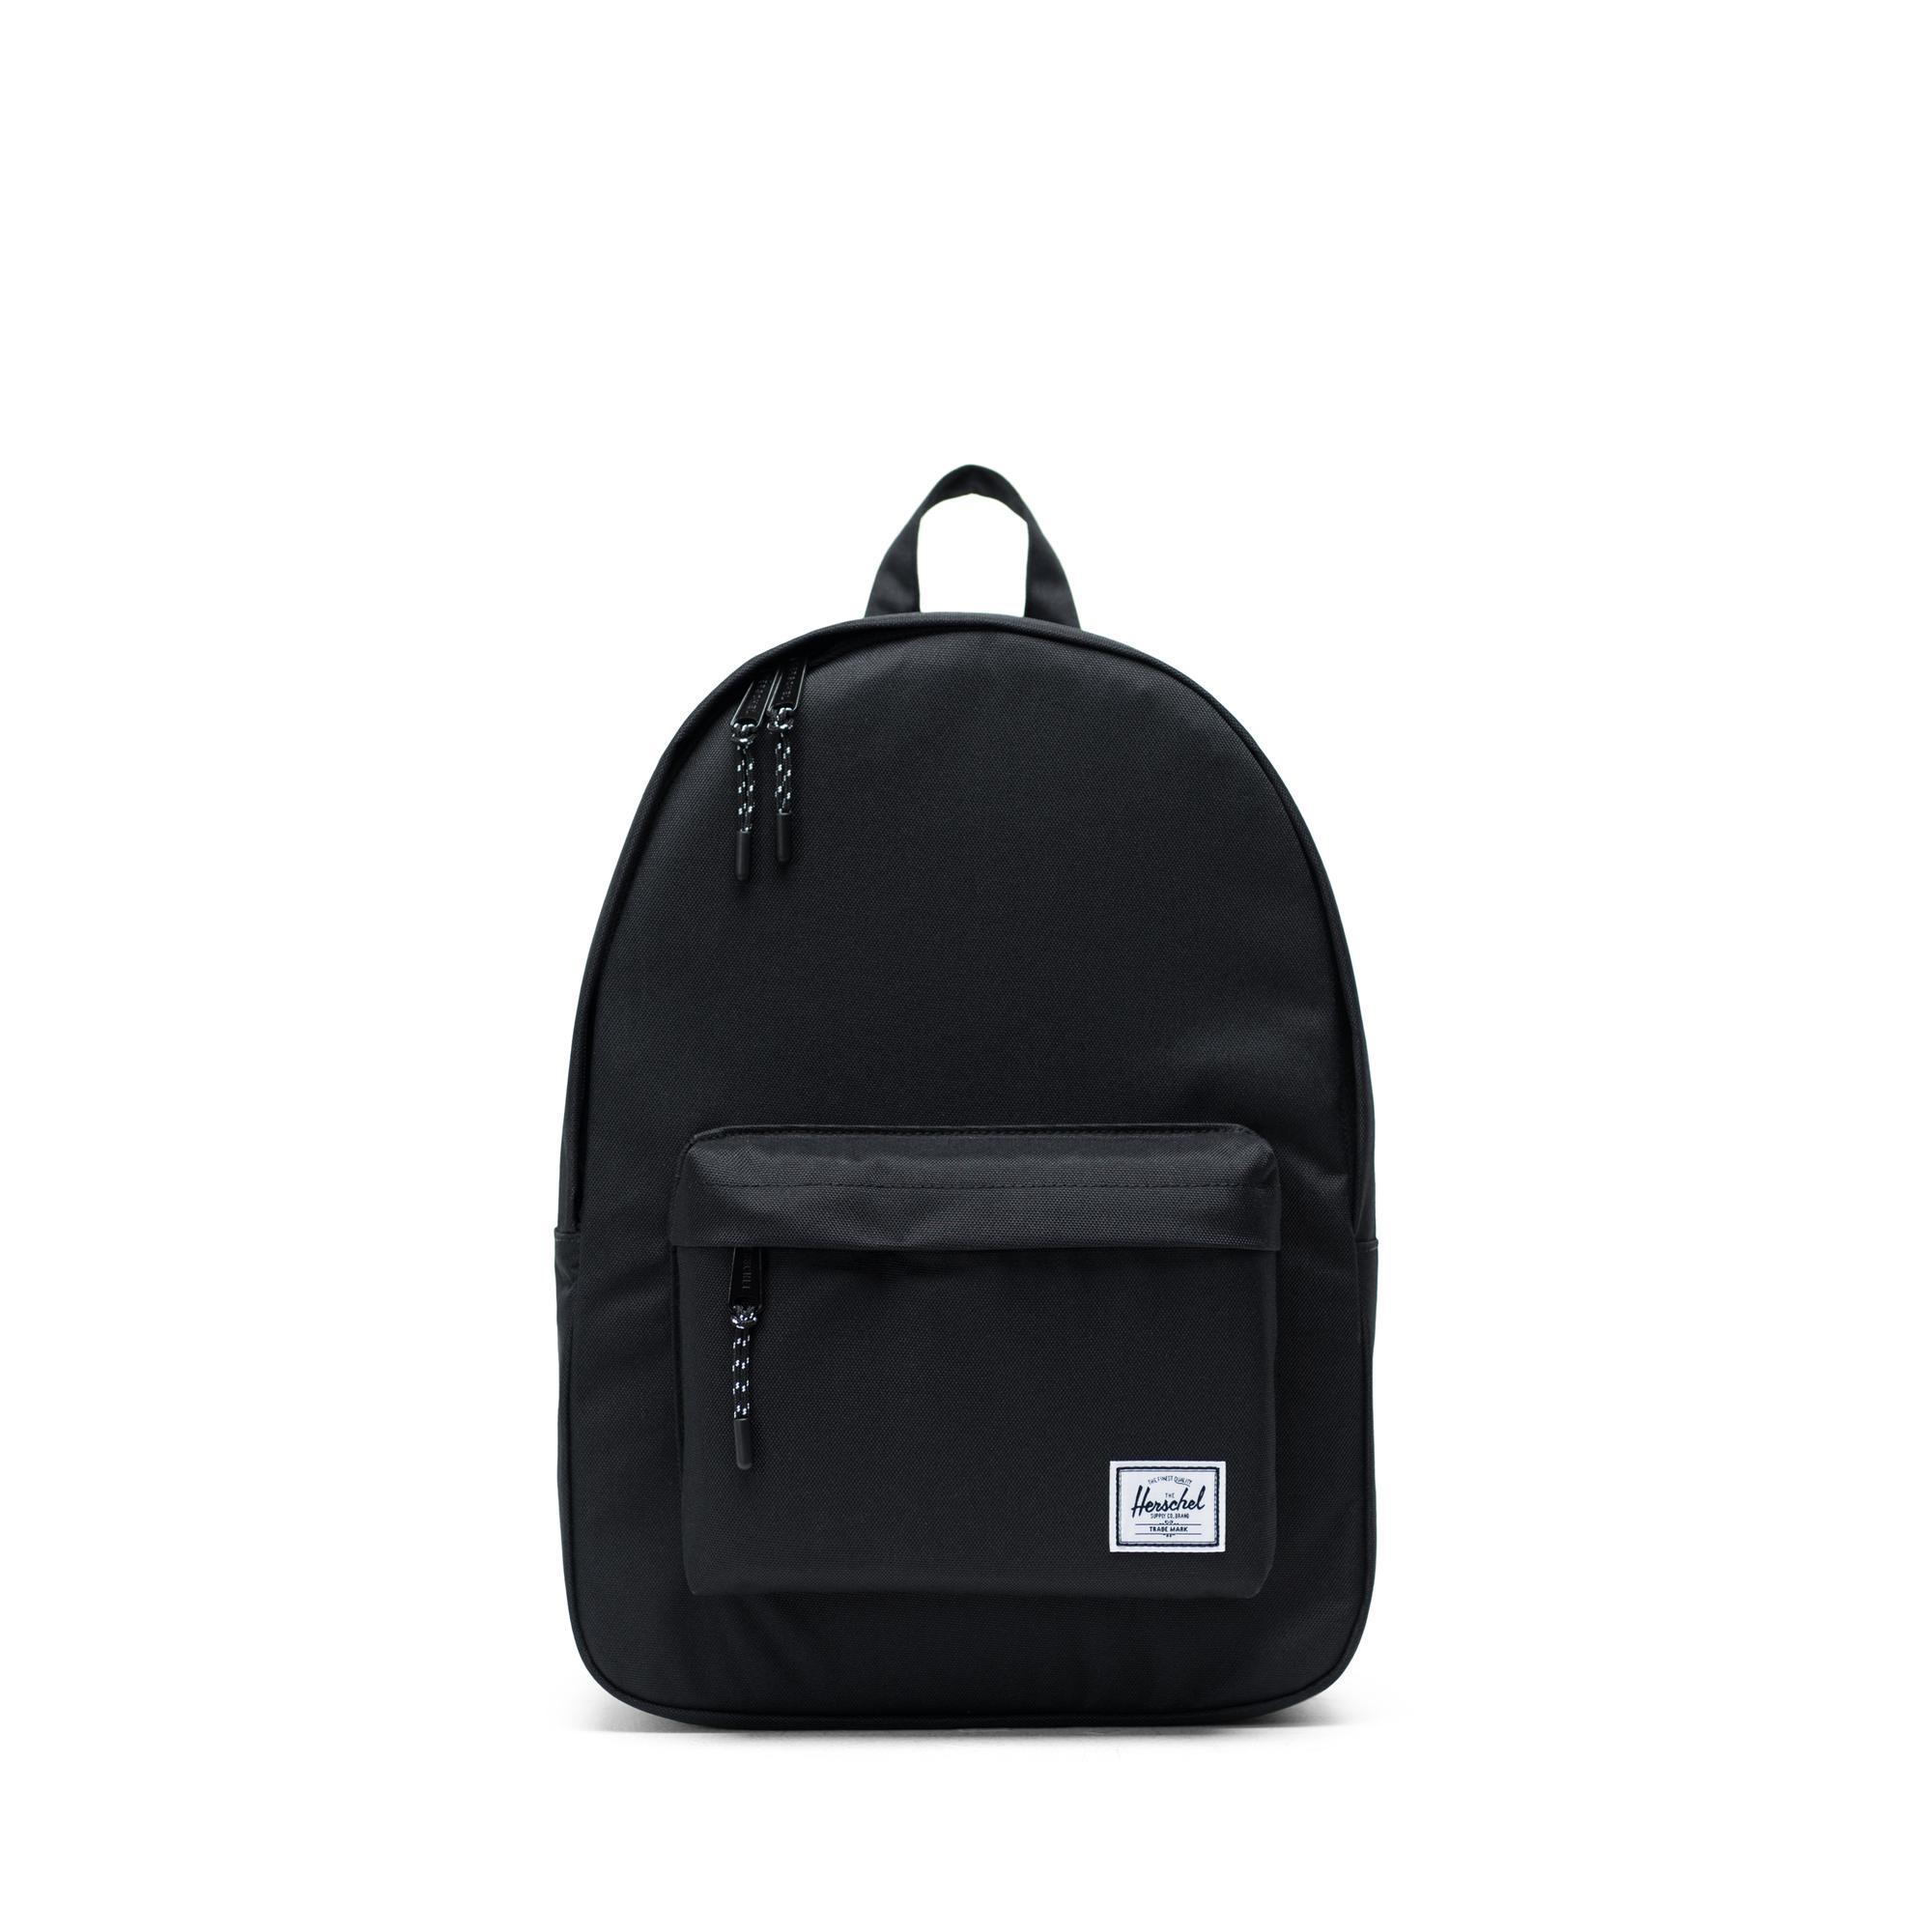 9322cf45219 Classic Backpack Mid-Volume